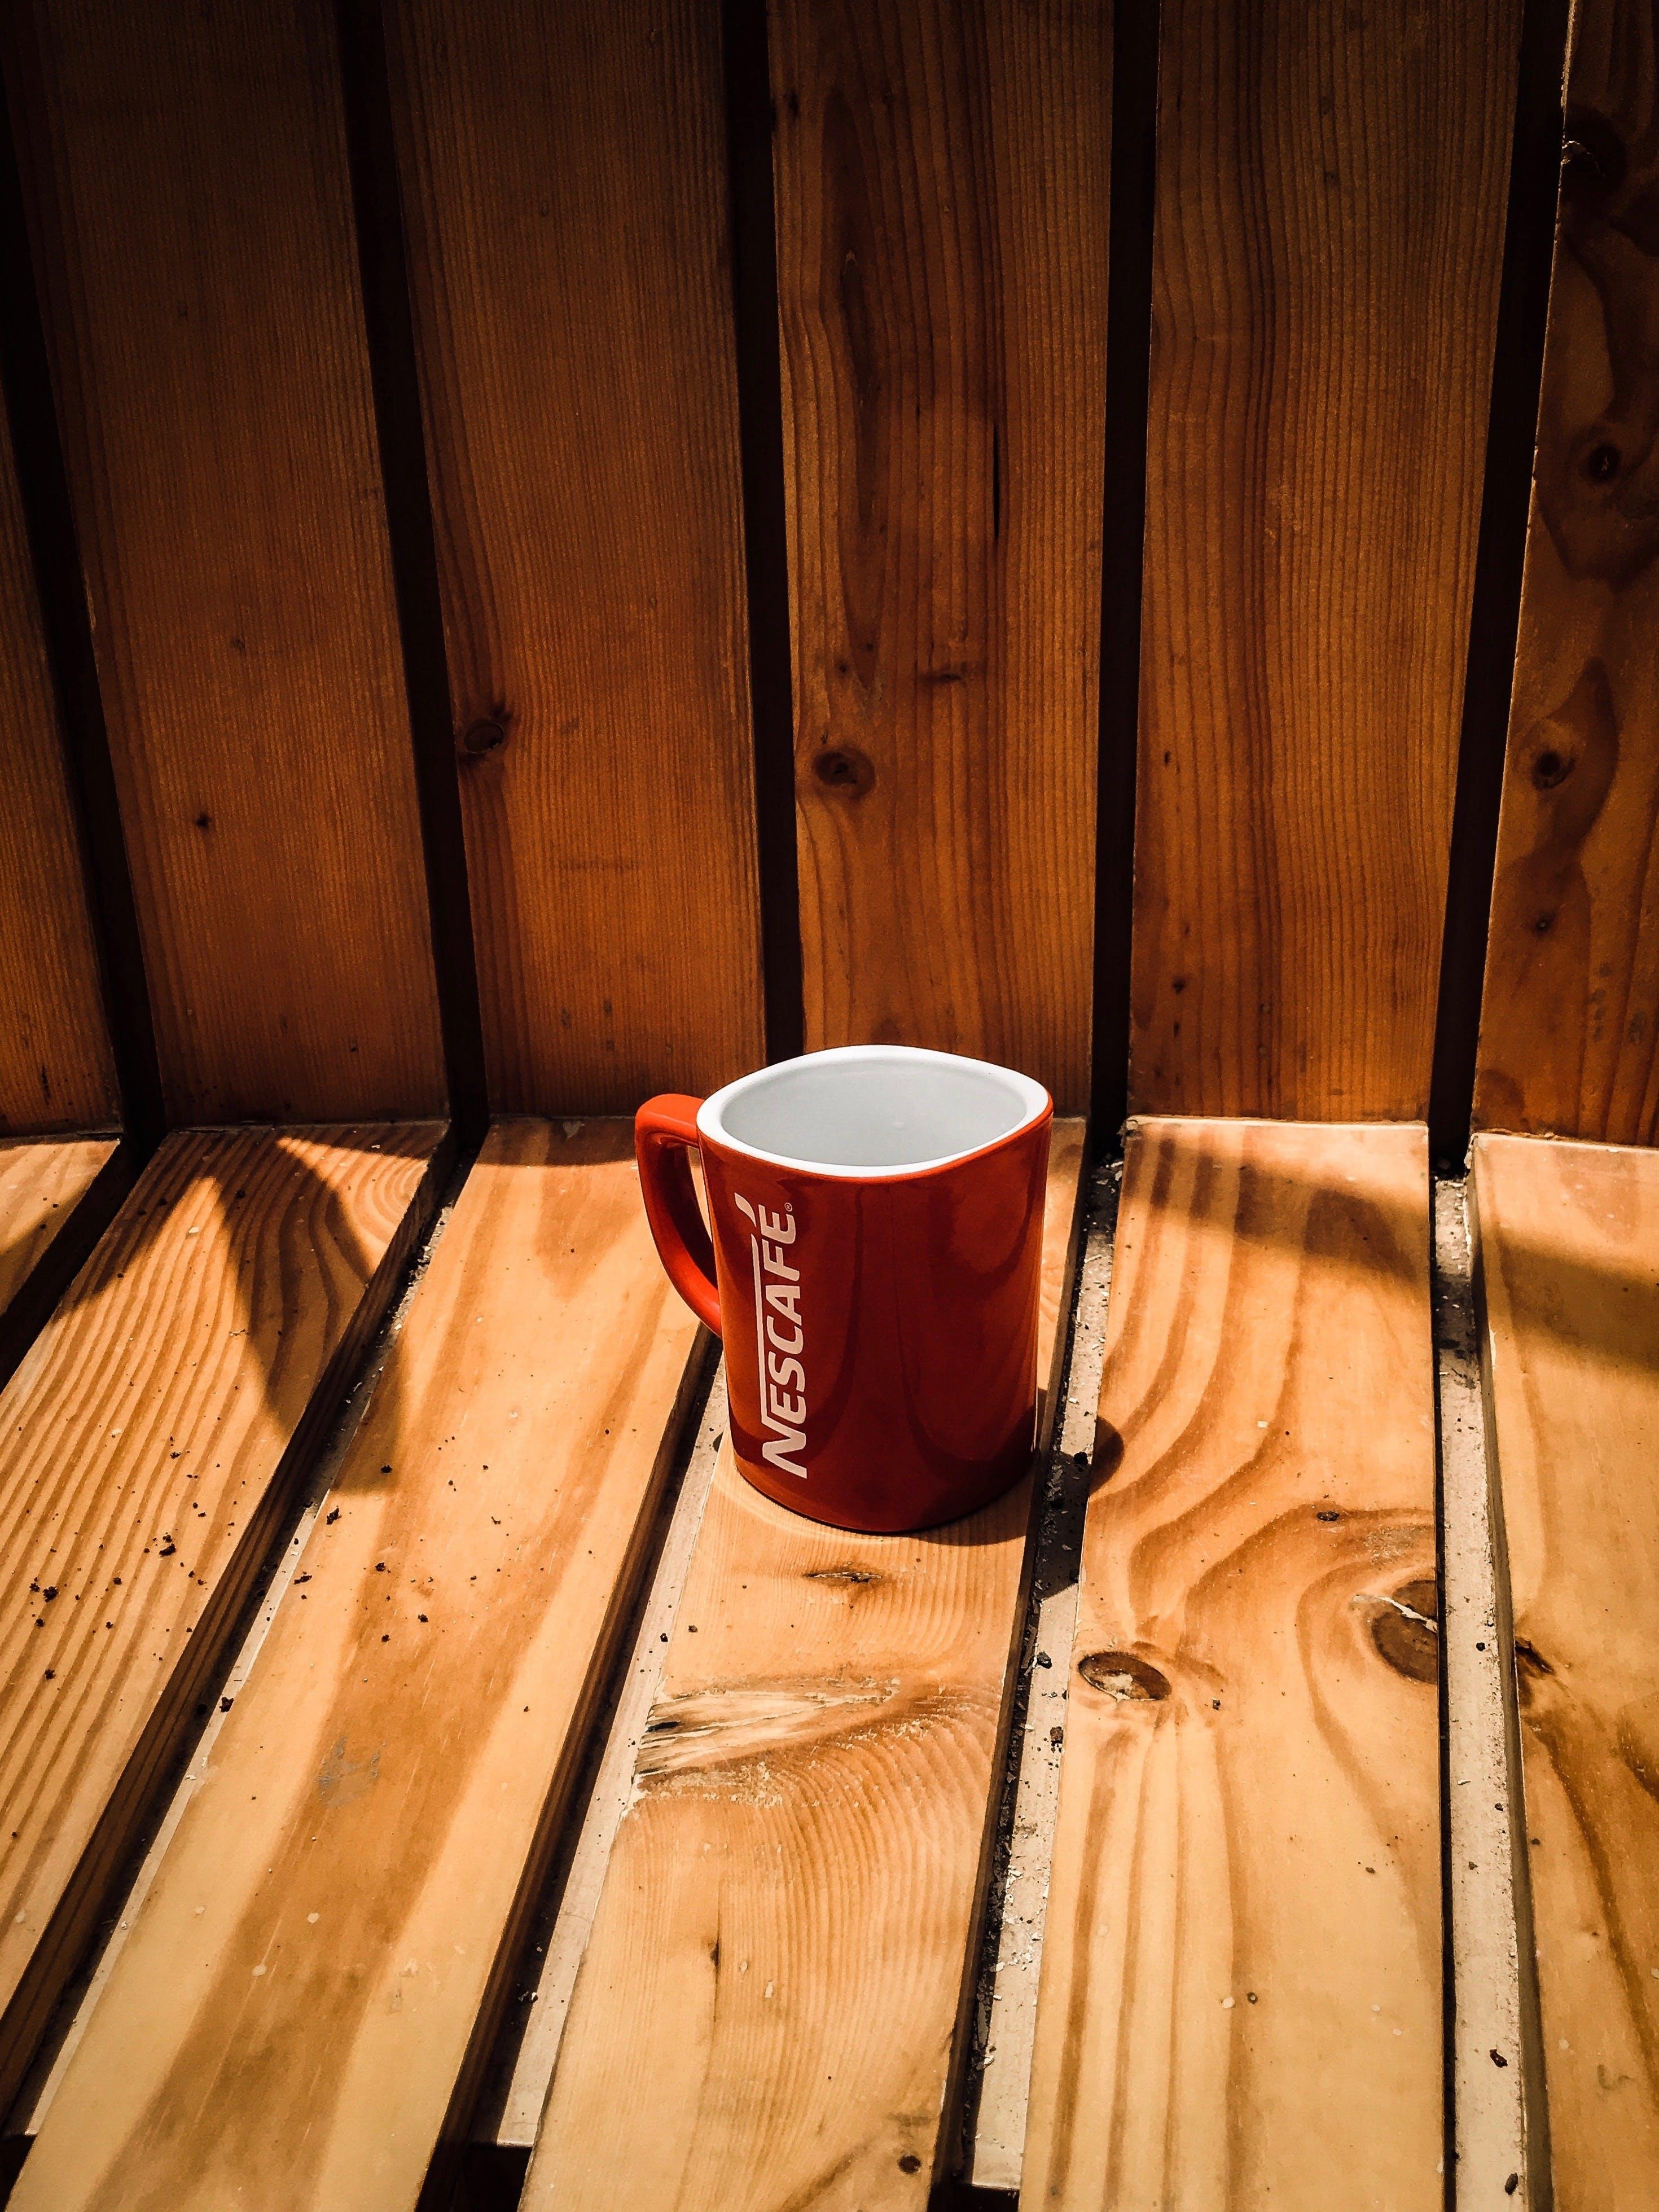 Free stock photo of #coffee #nescafe #coffeemug